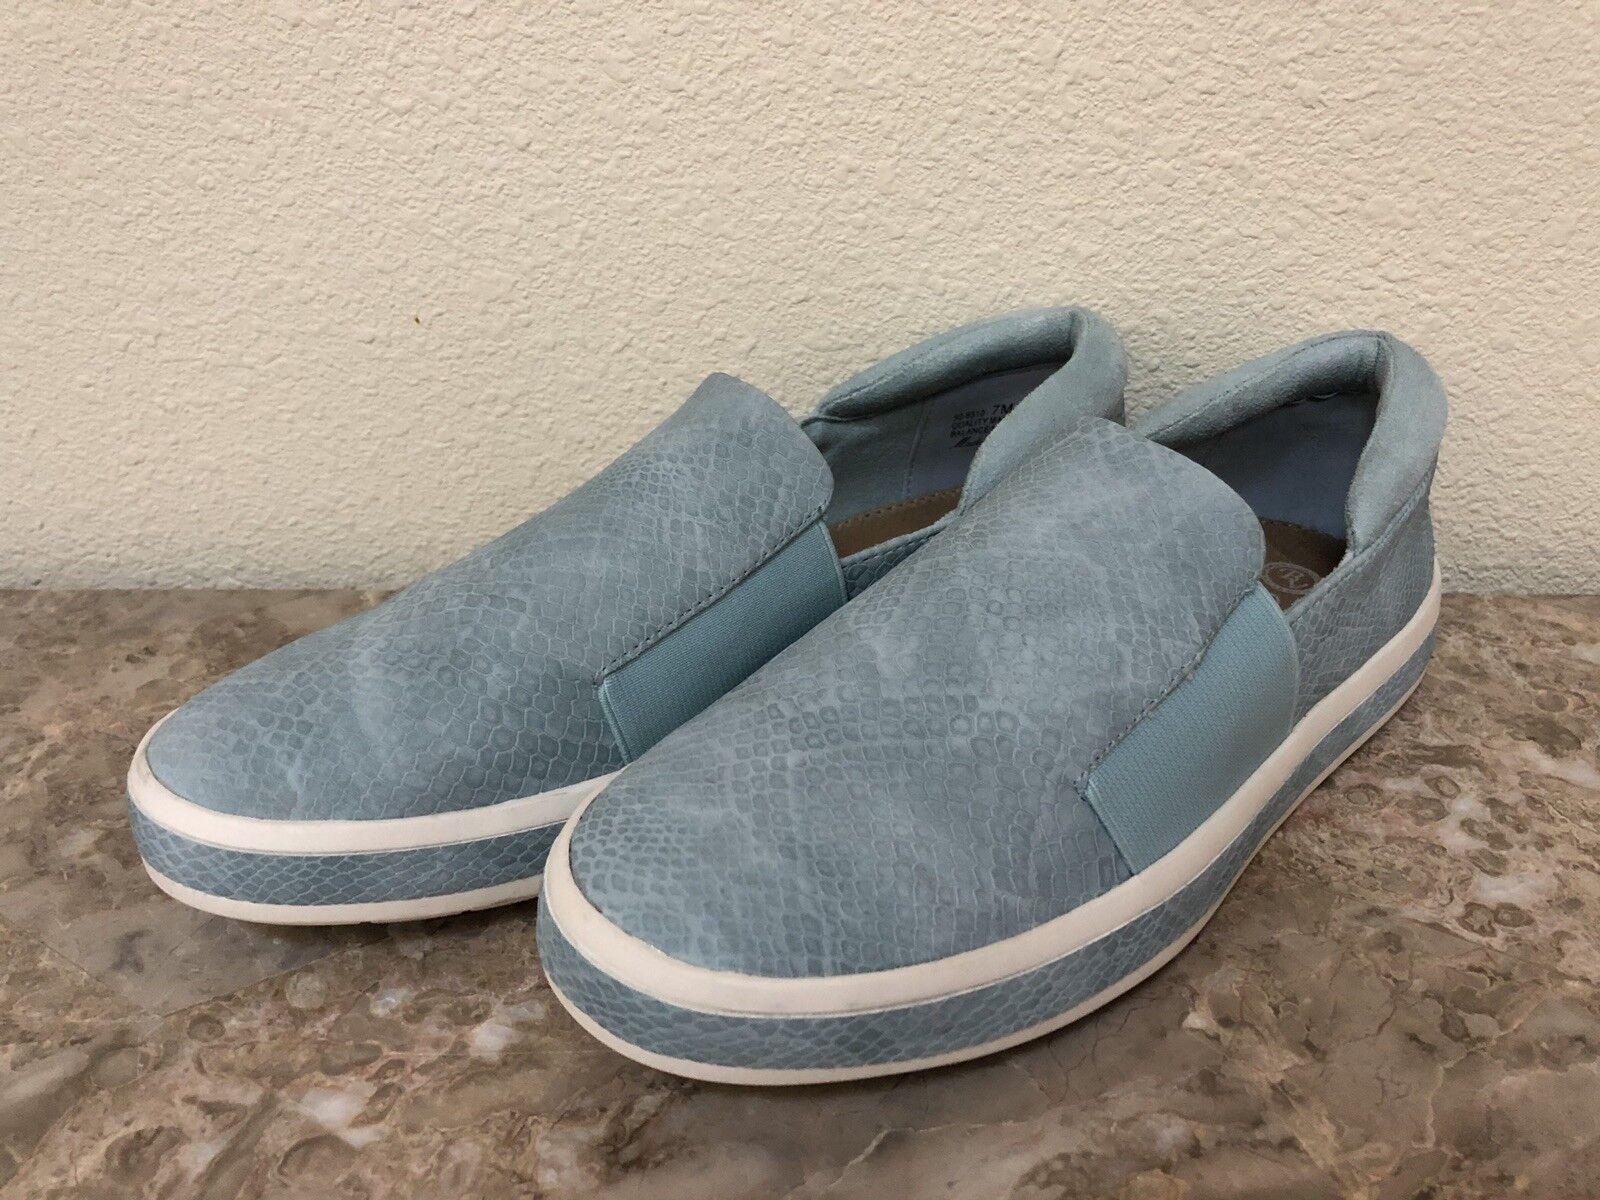 New BELLA VITA WOMEN'S bluee shoes FLATS SLIP ON Sneakers Size 7M